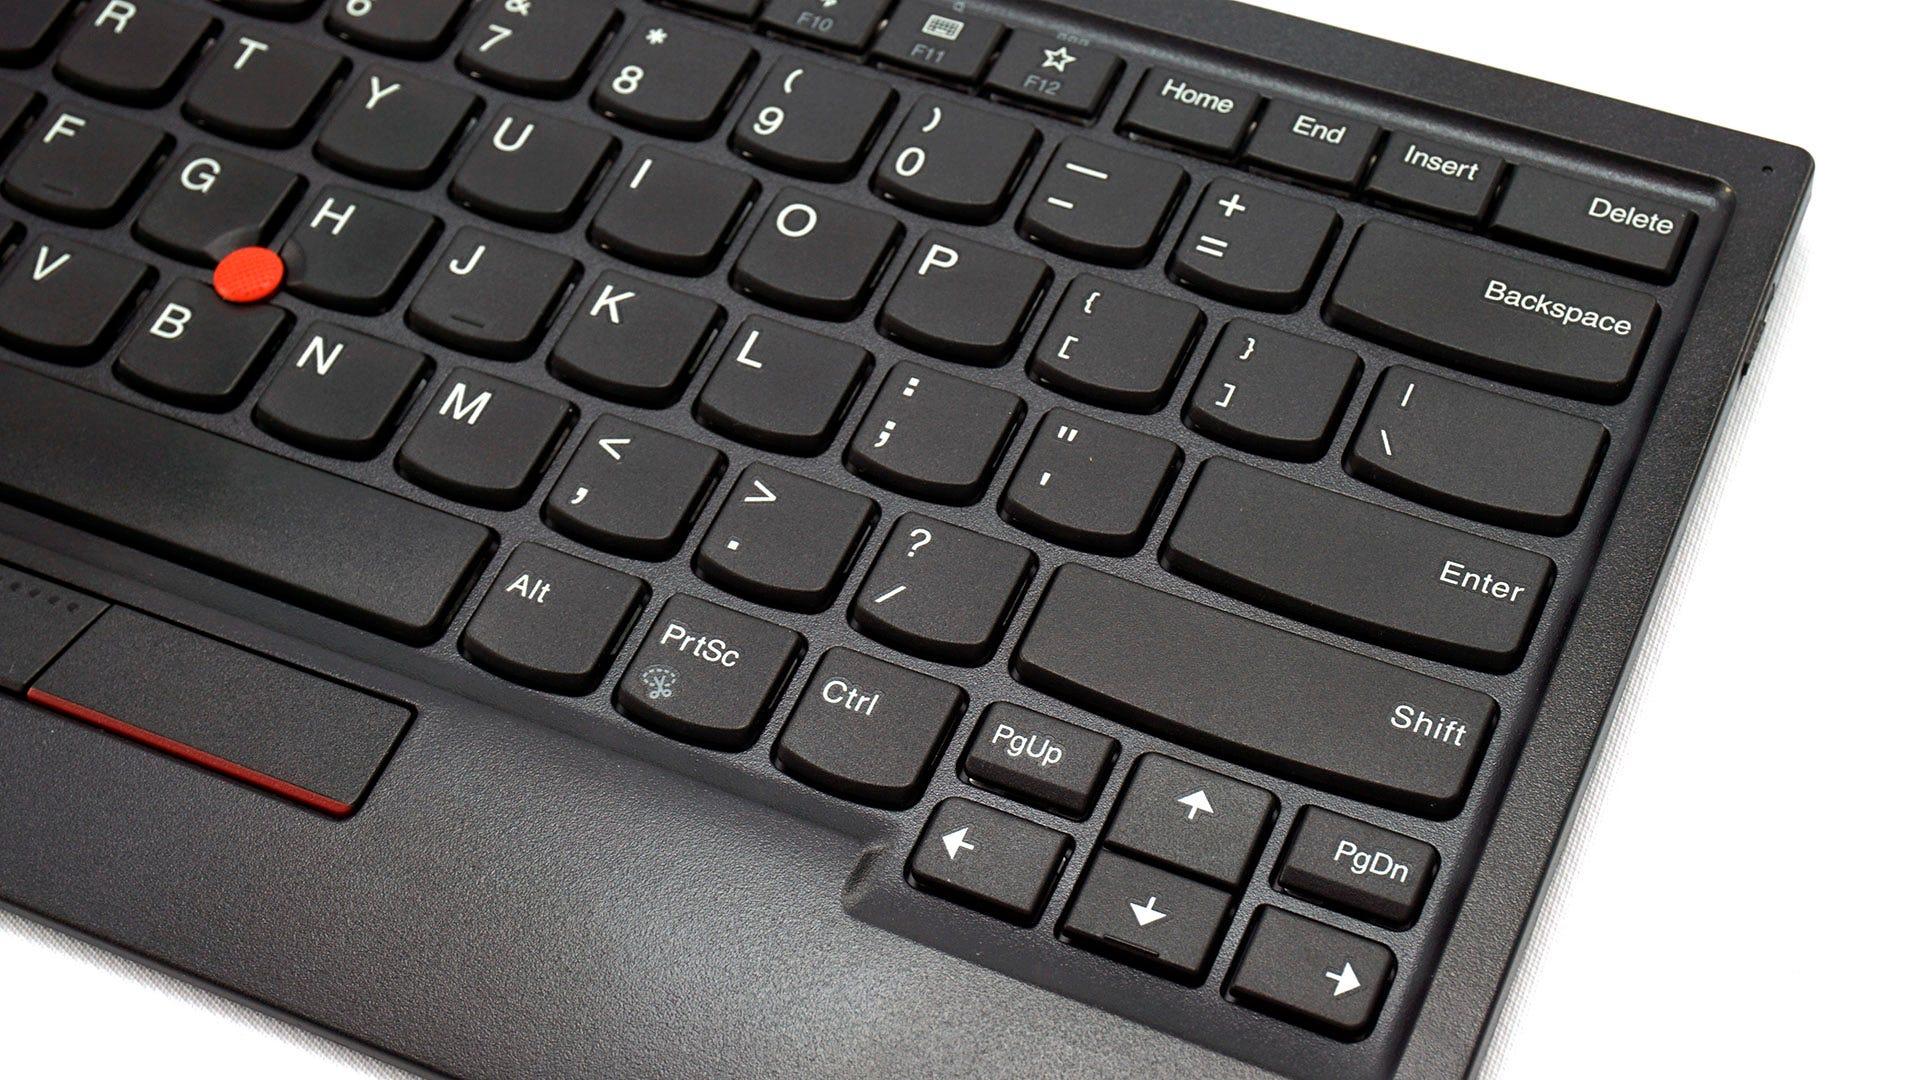 ThinkPad keyboard right side cluster